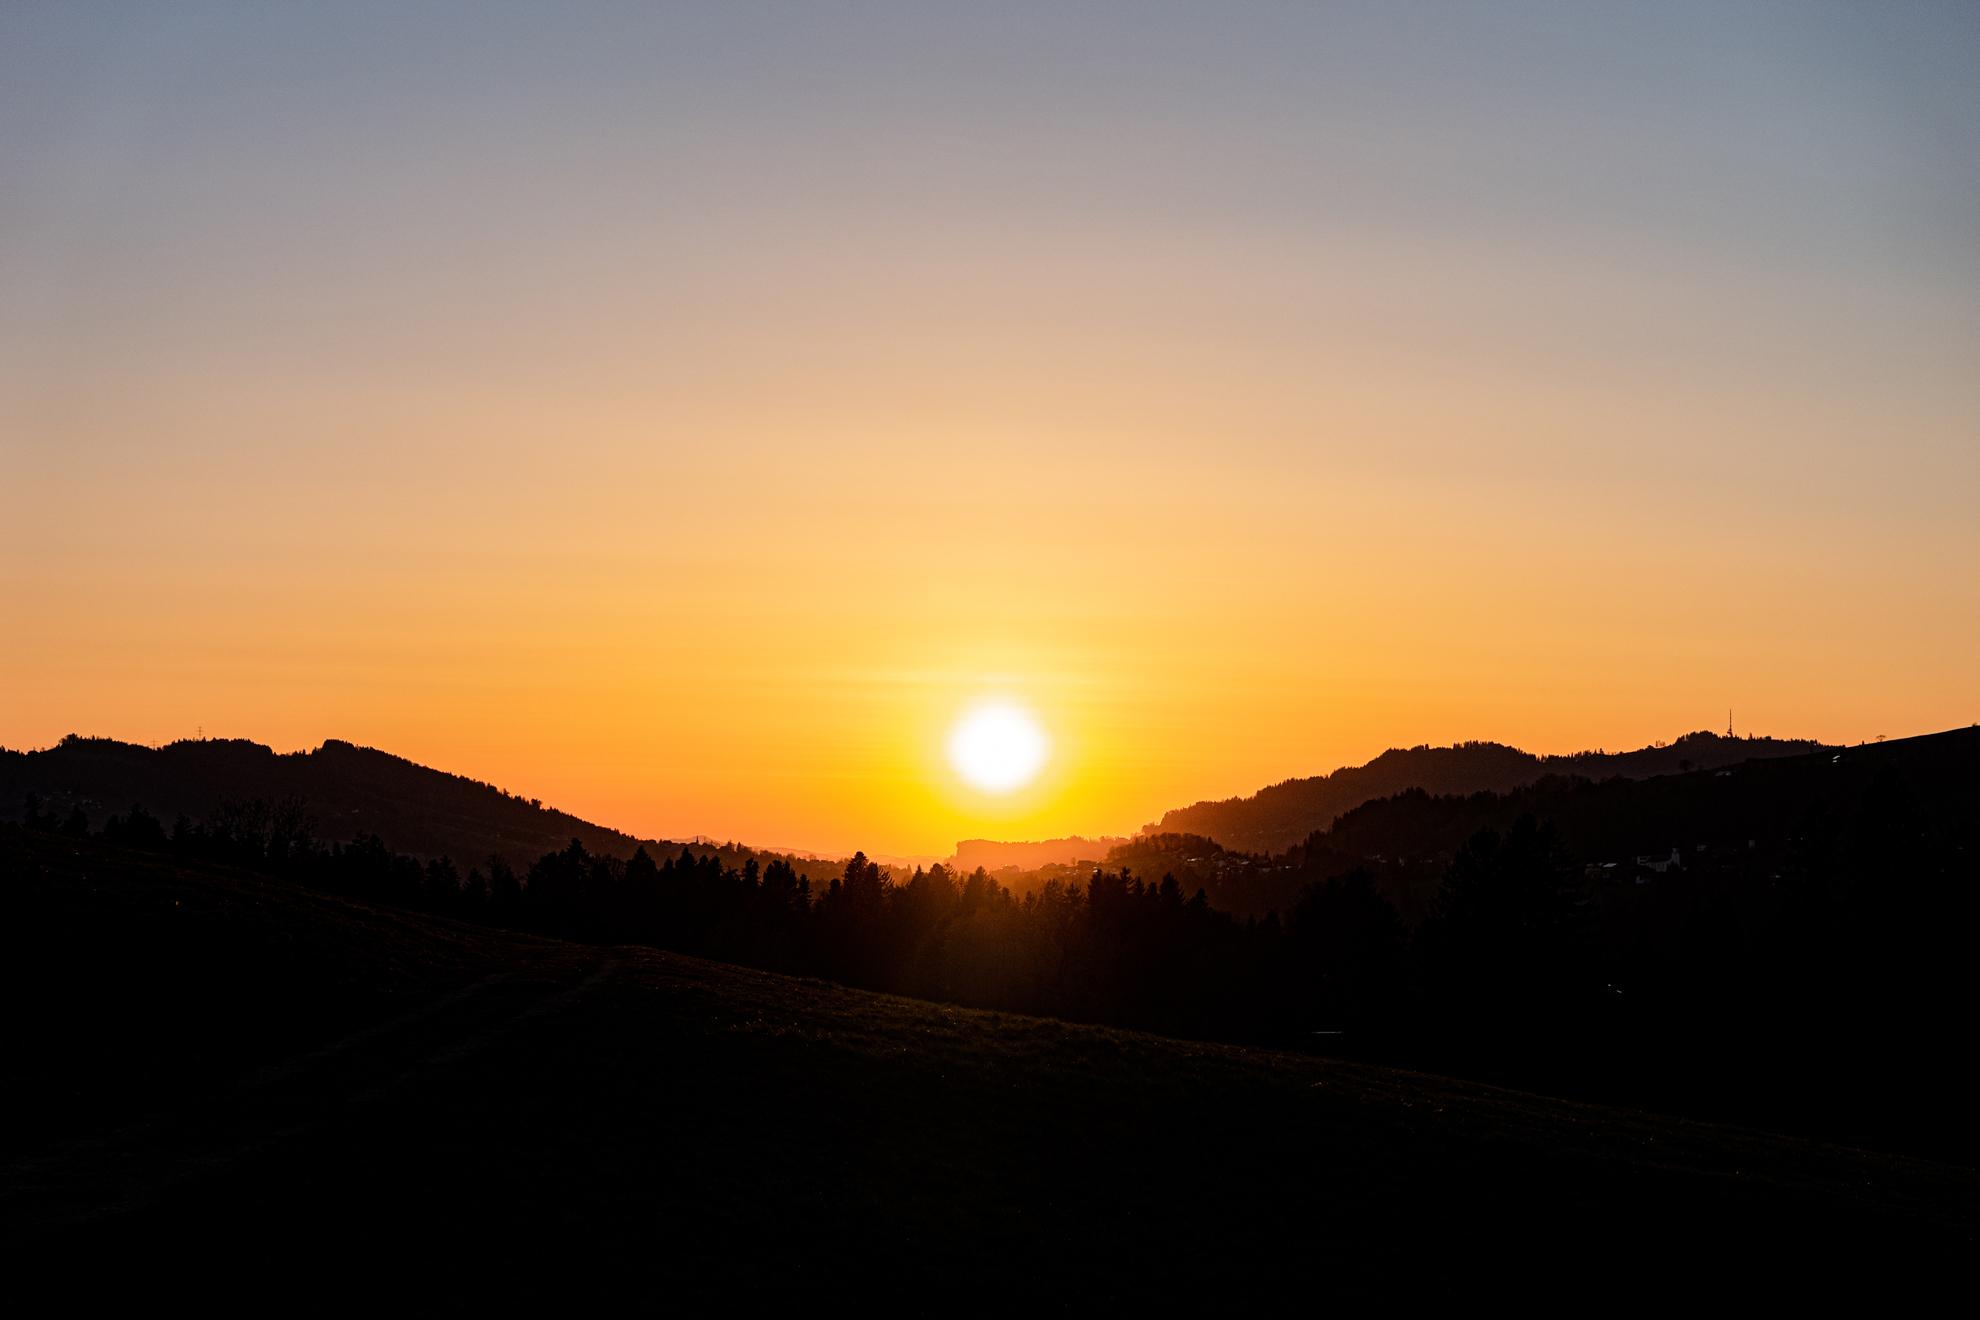 Sonnenuntergang am 23. März 2020